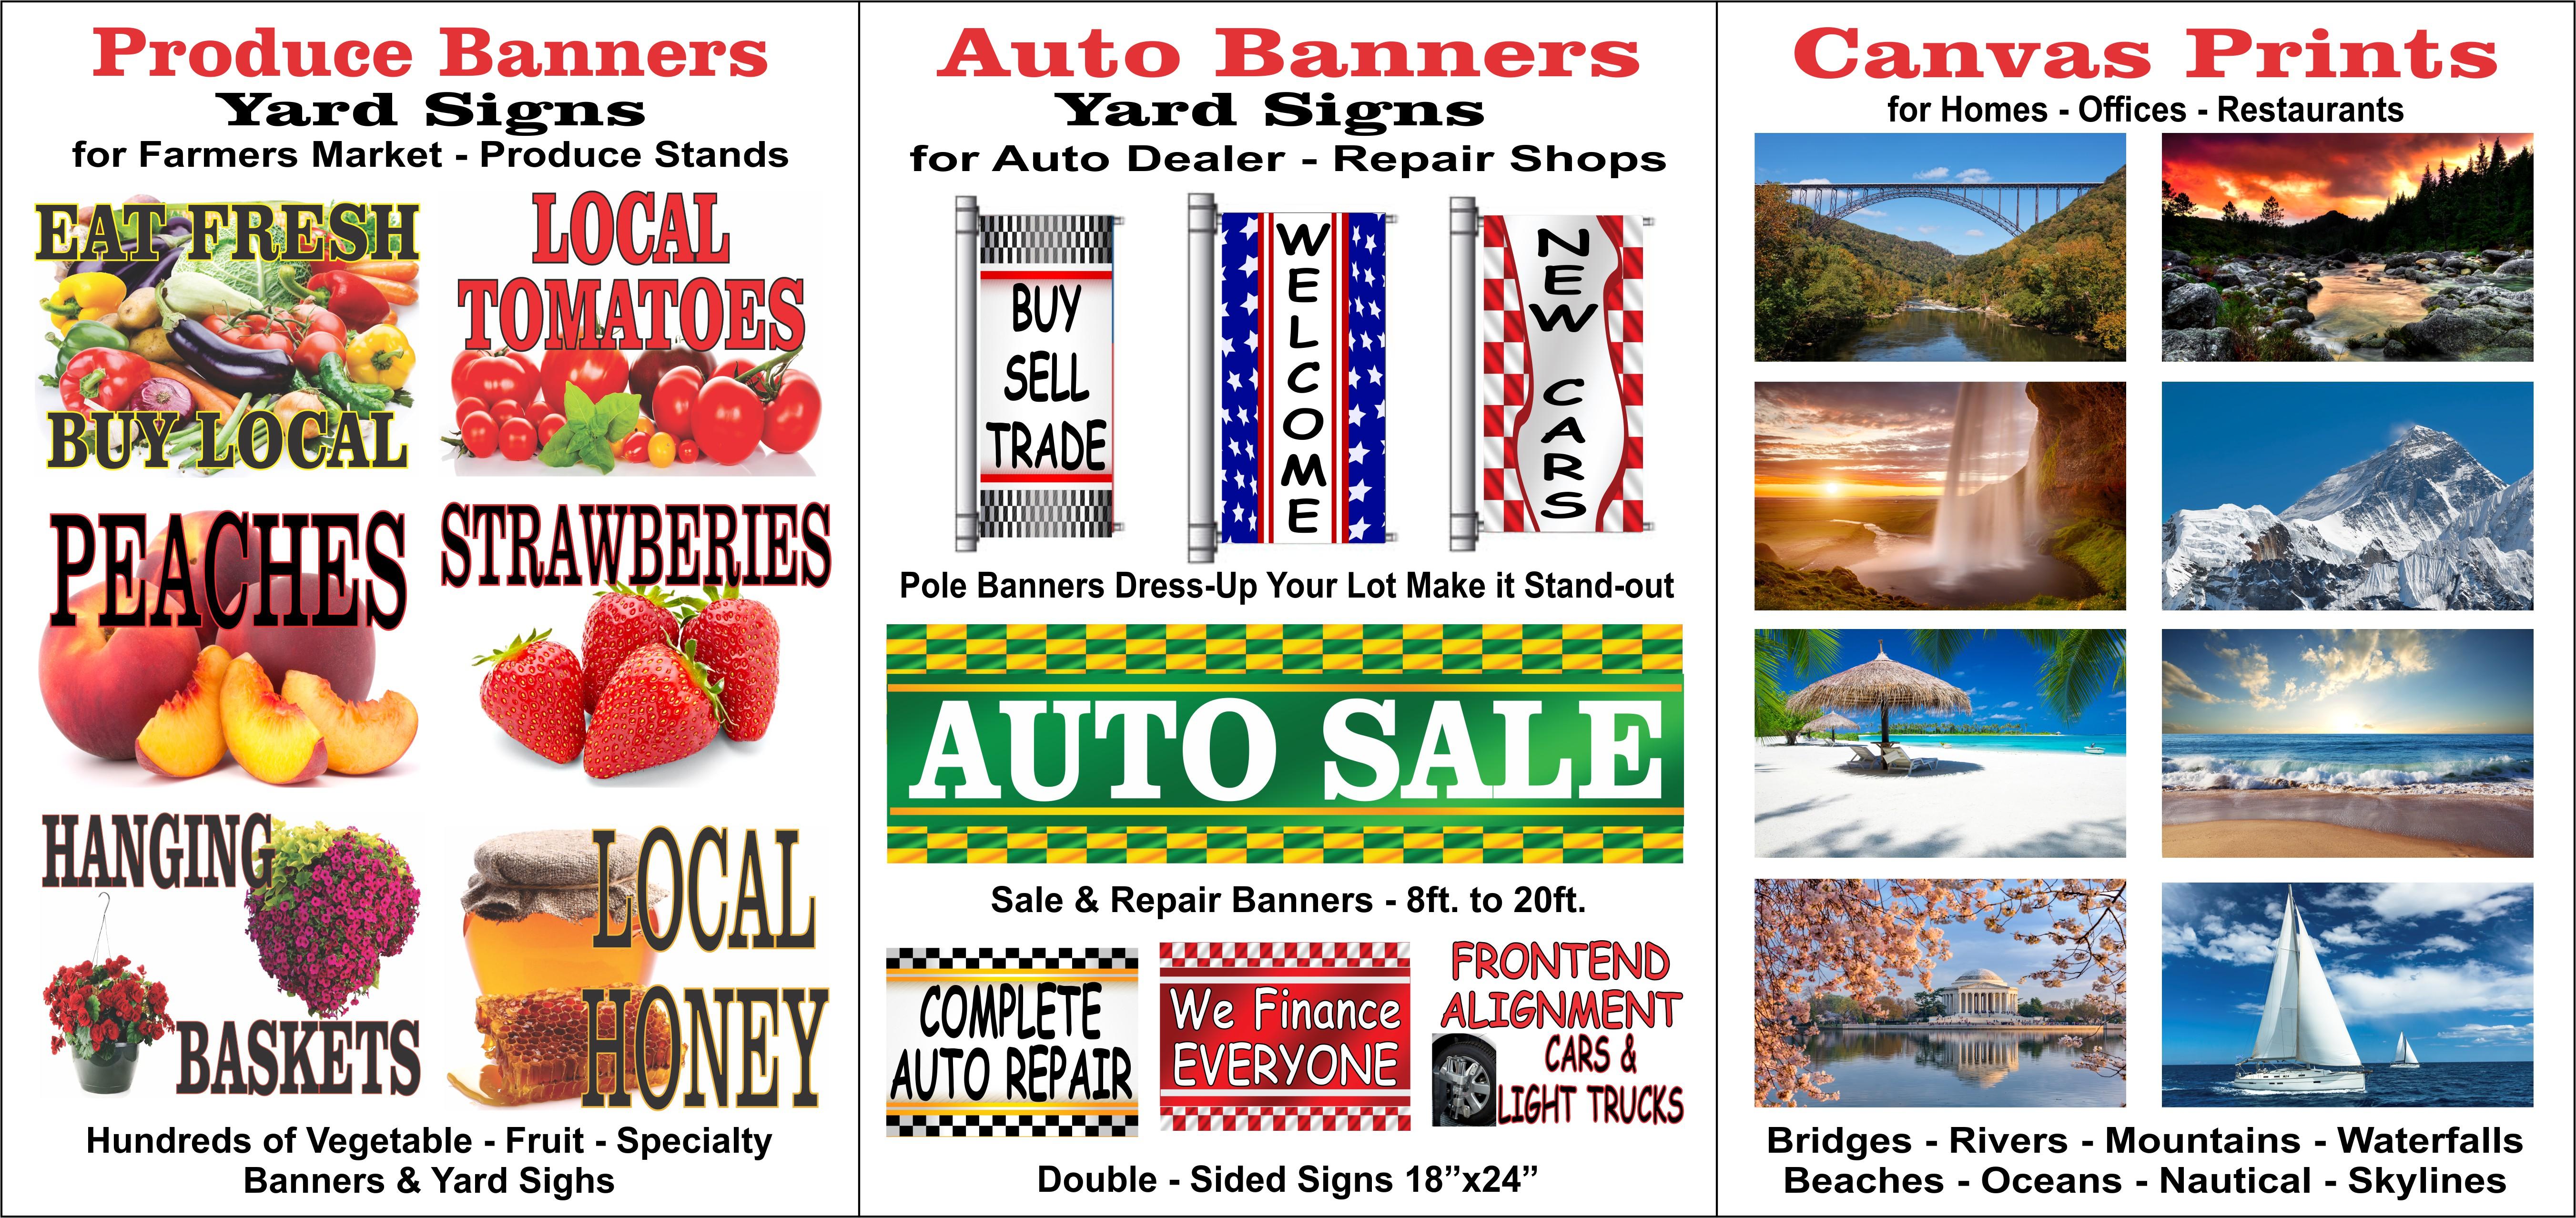 big-commerce-banner.jpg